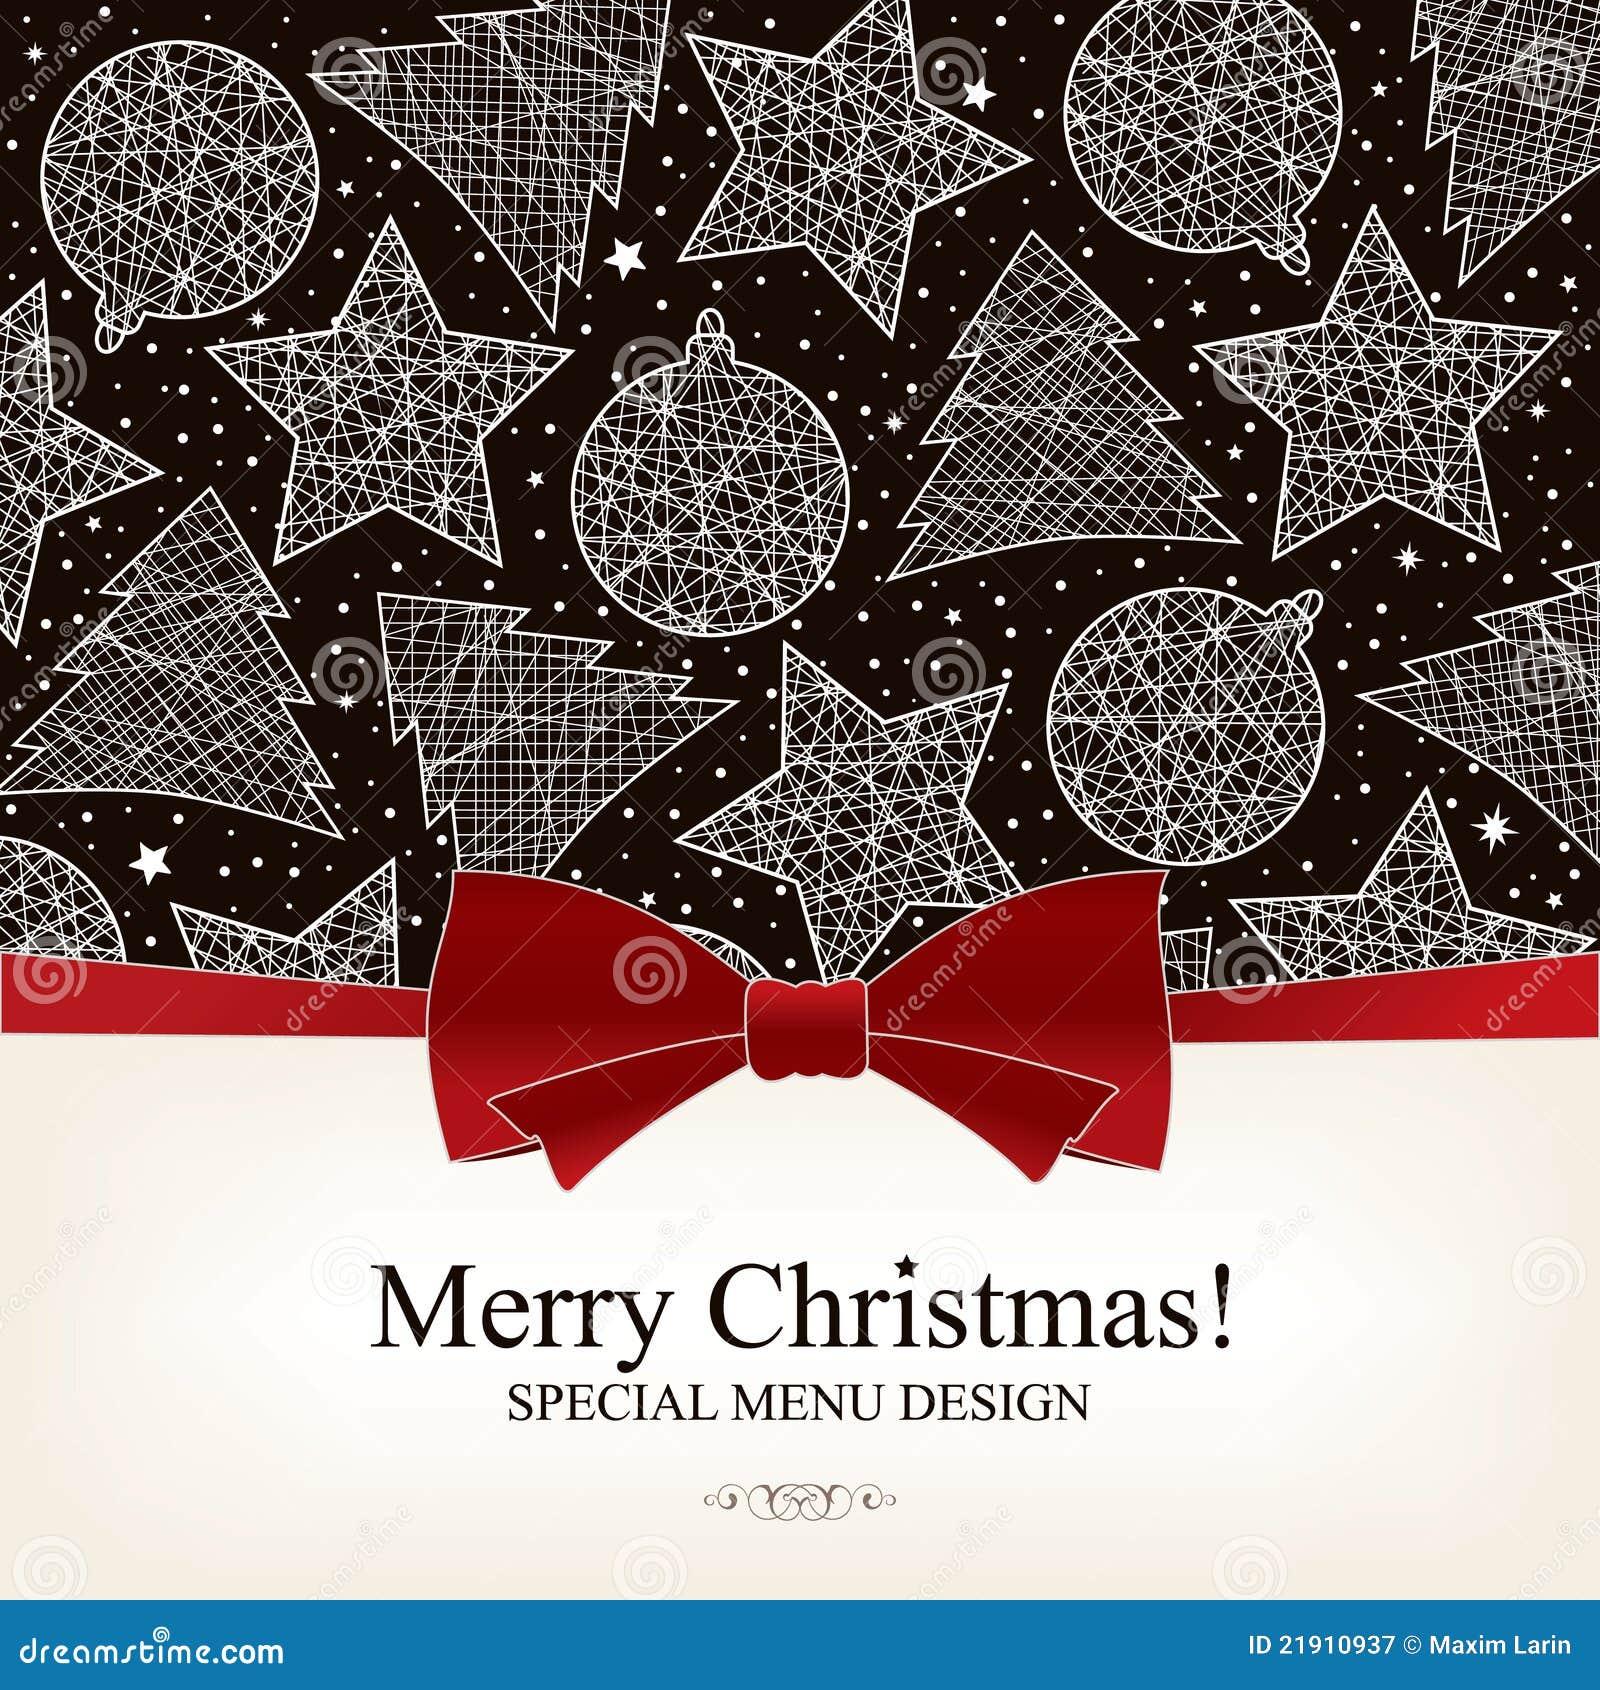 special christmas menu design stock vector illustration of